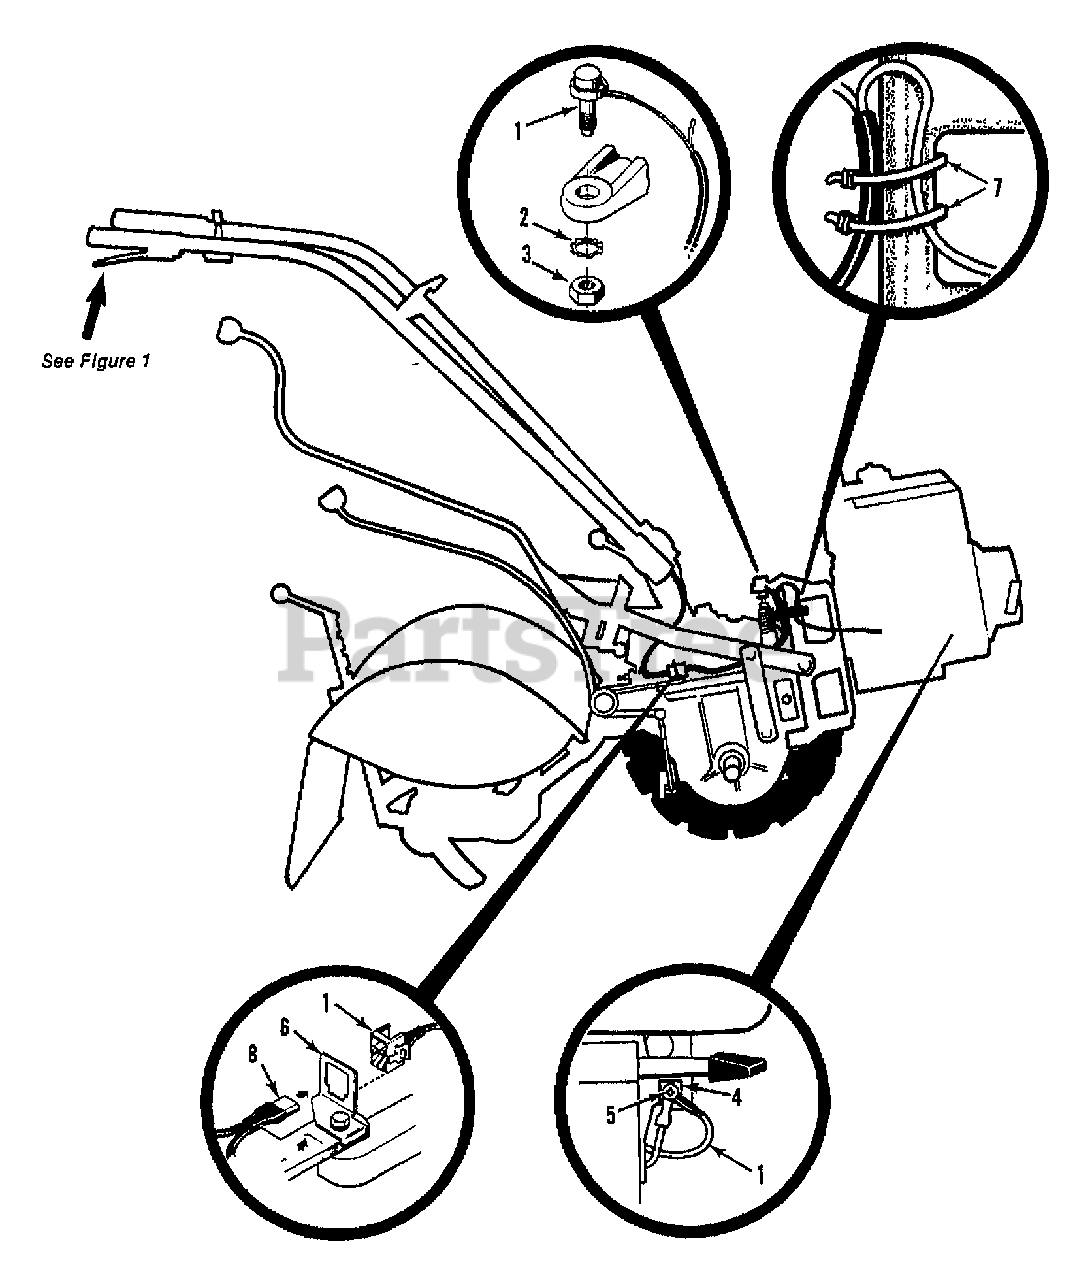 Troy Bilt Parts On The Forward Interlock System Diagram